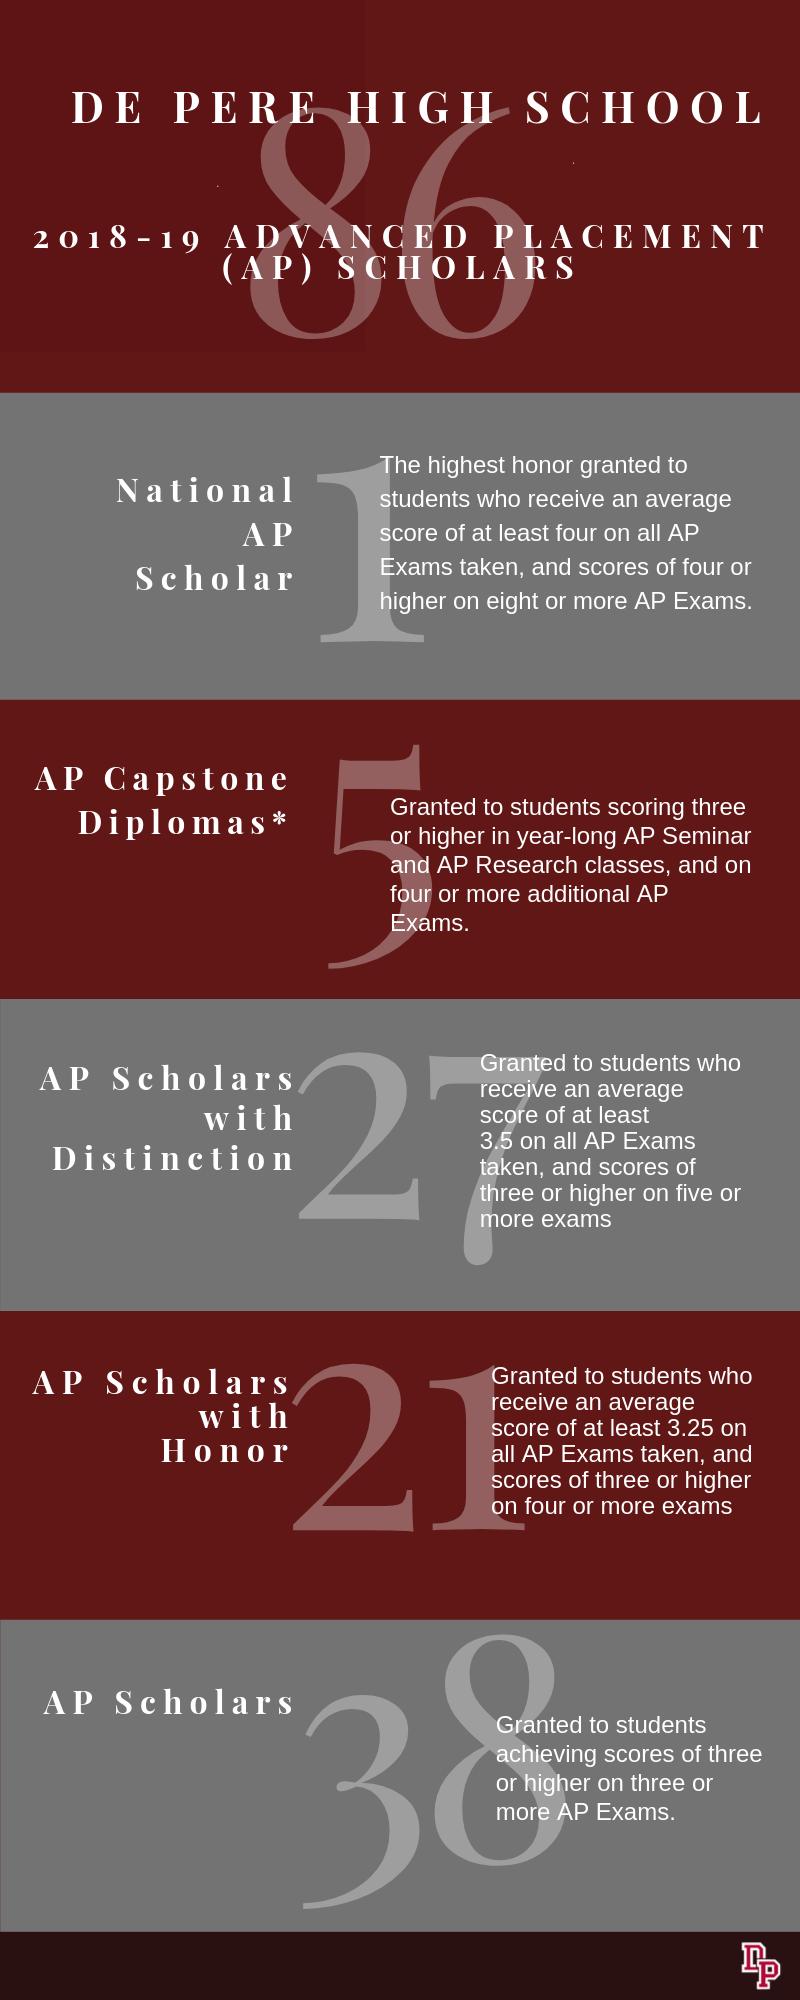 number of AP scholars